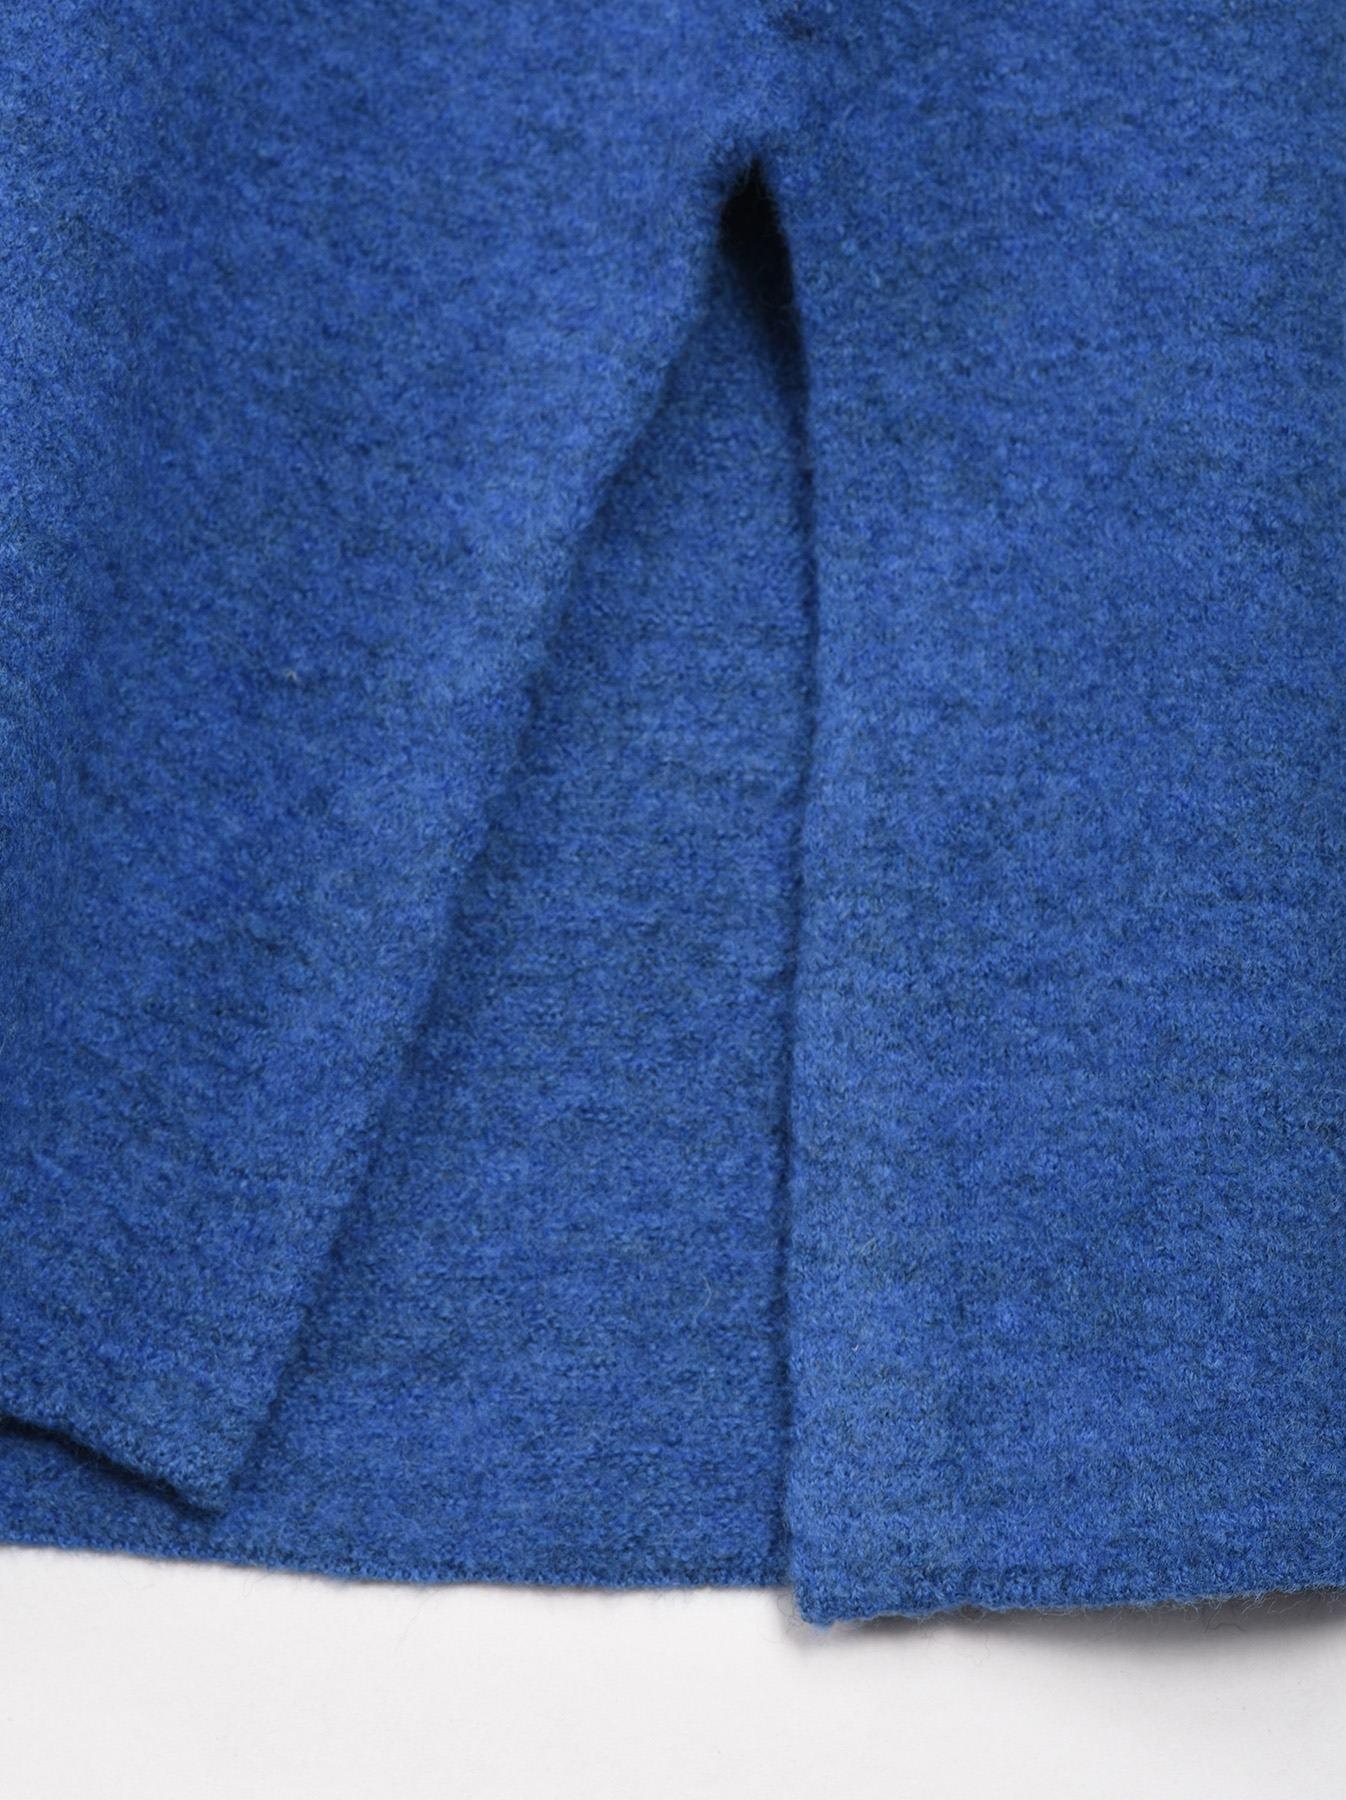 WH Arles Boiled Wool Stripe Big Tunic-12